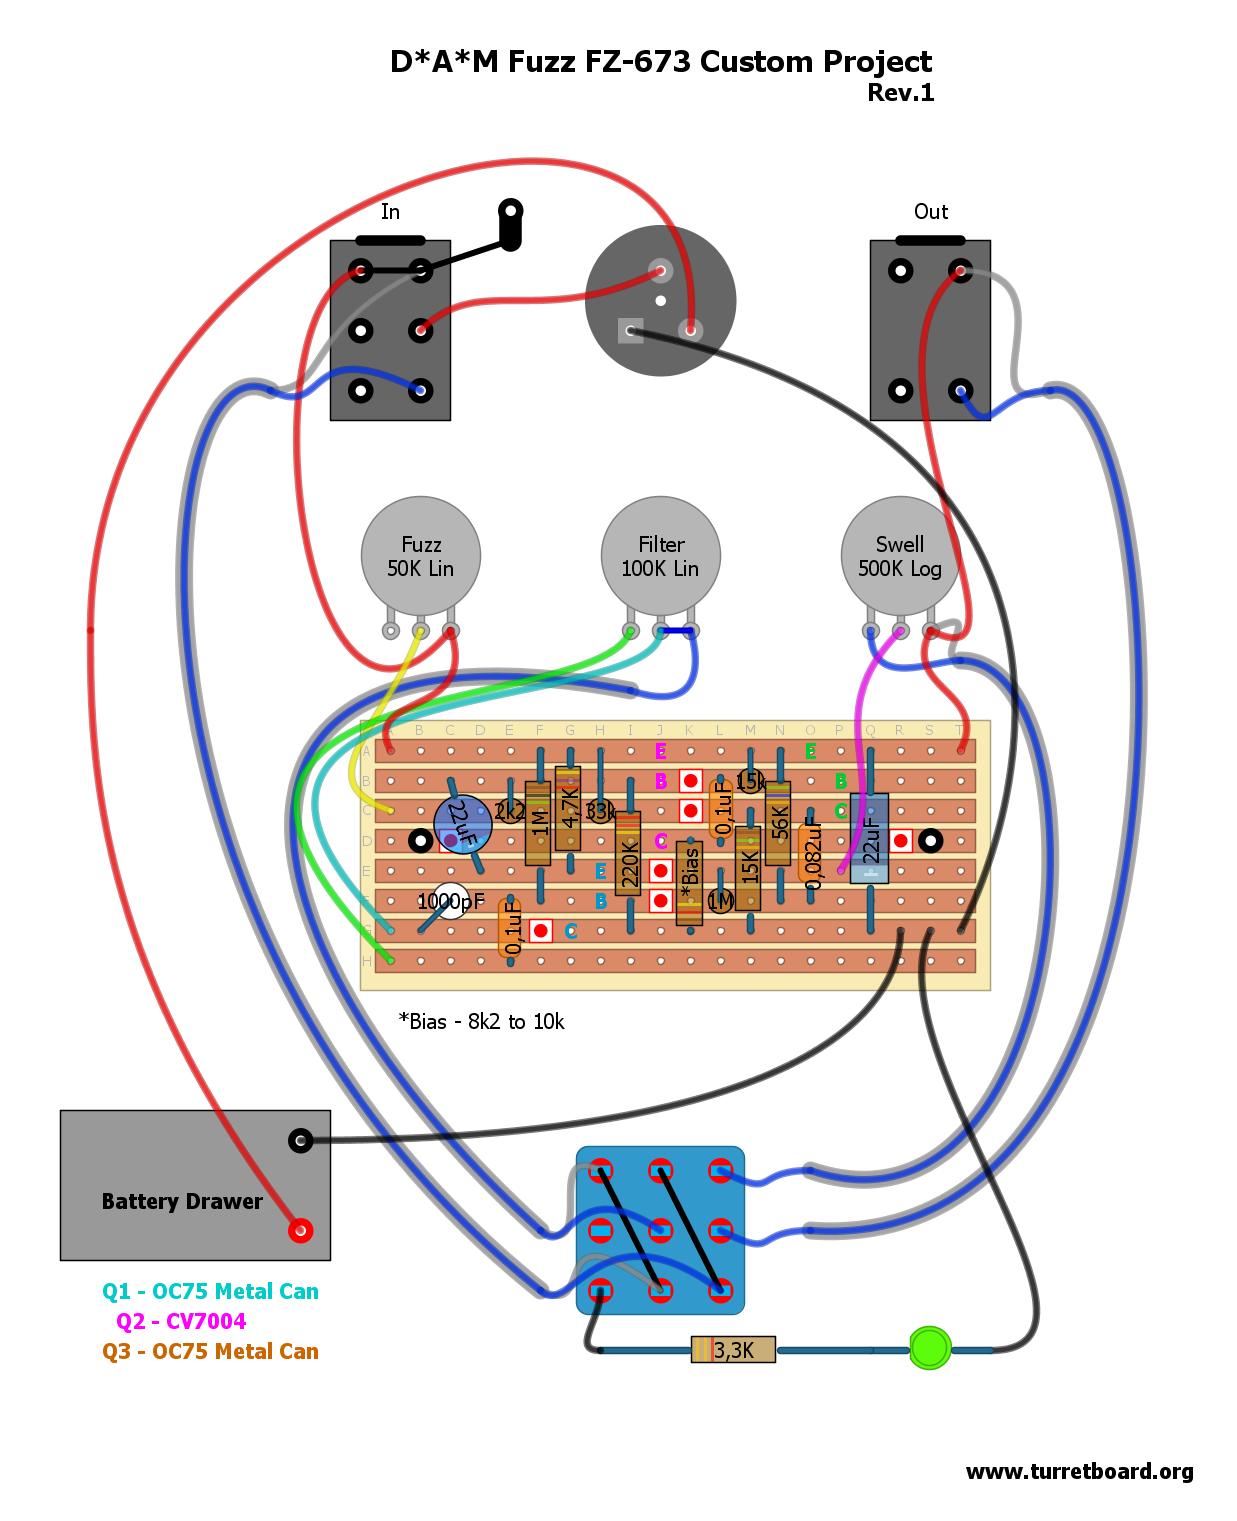 fuzz673rev1 offboard wiring diagram computer case wiring diagram, home wiring  at alyssarenee.co